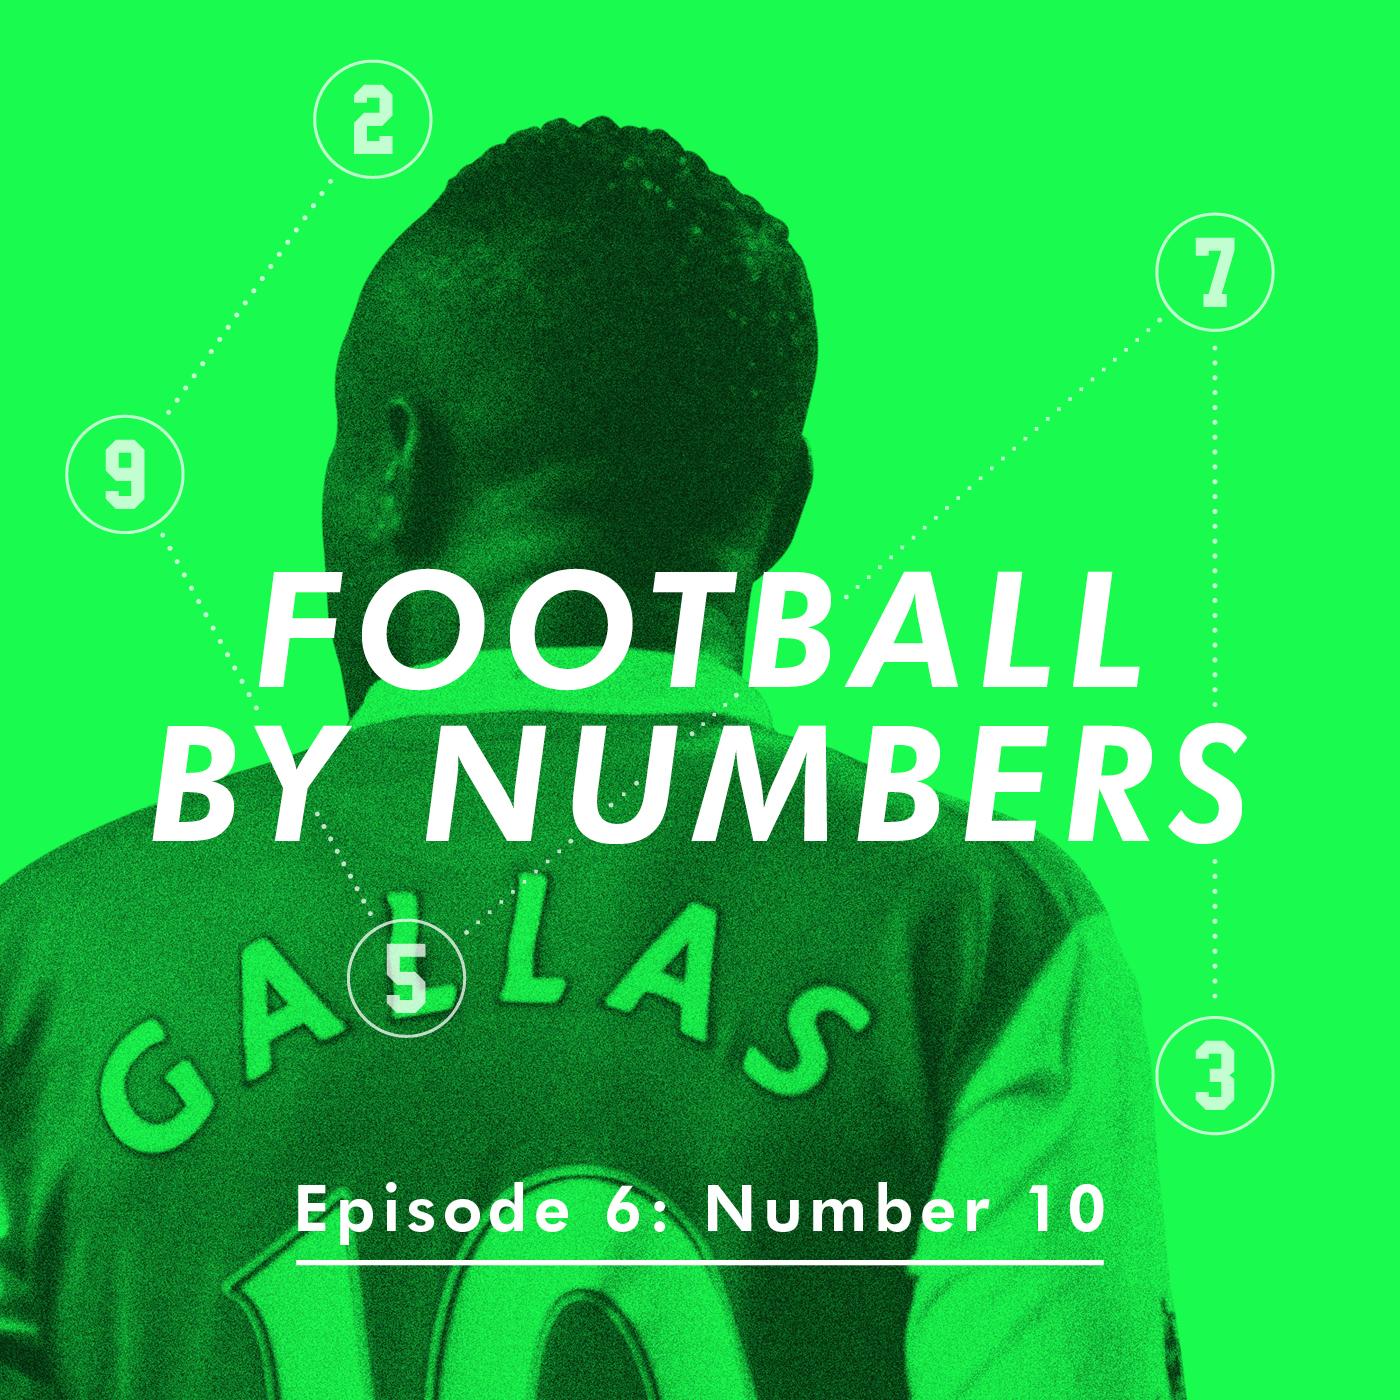 FootballByNumbers-Covers-E6.jpg